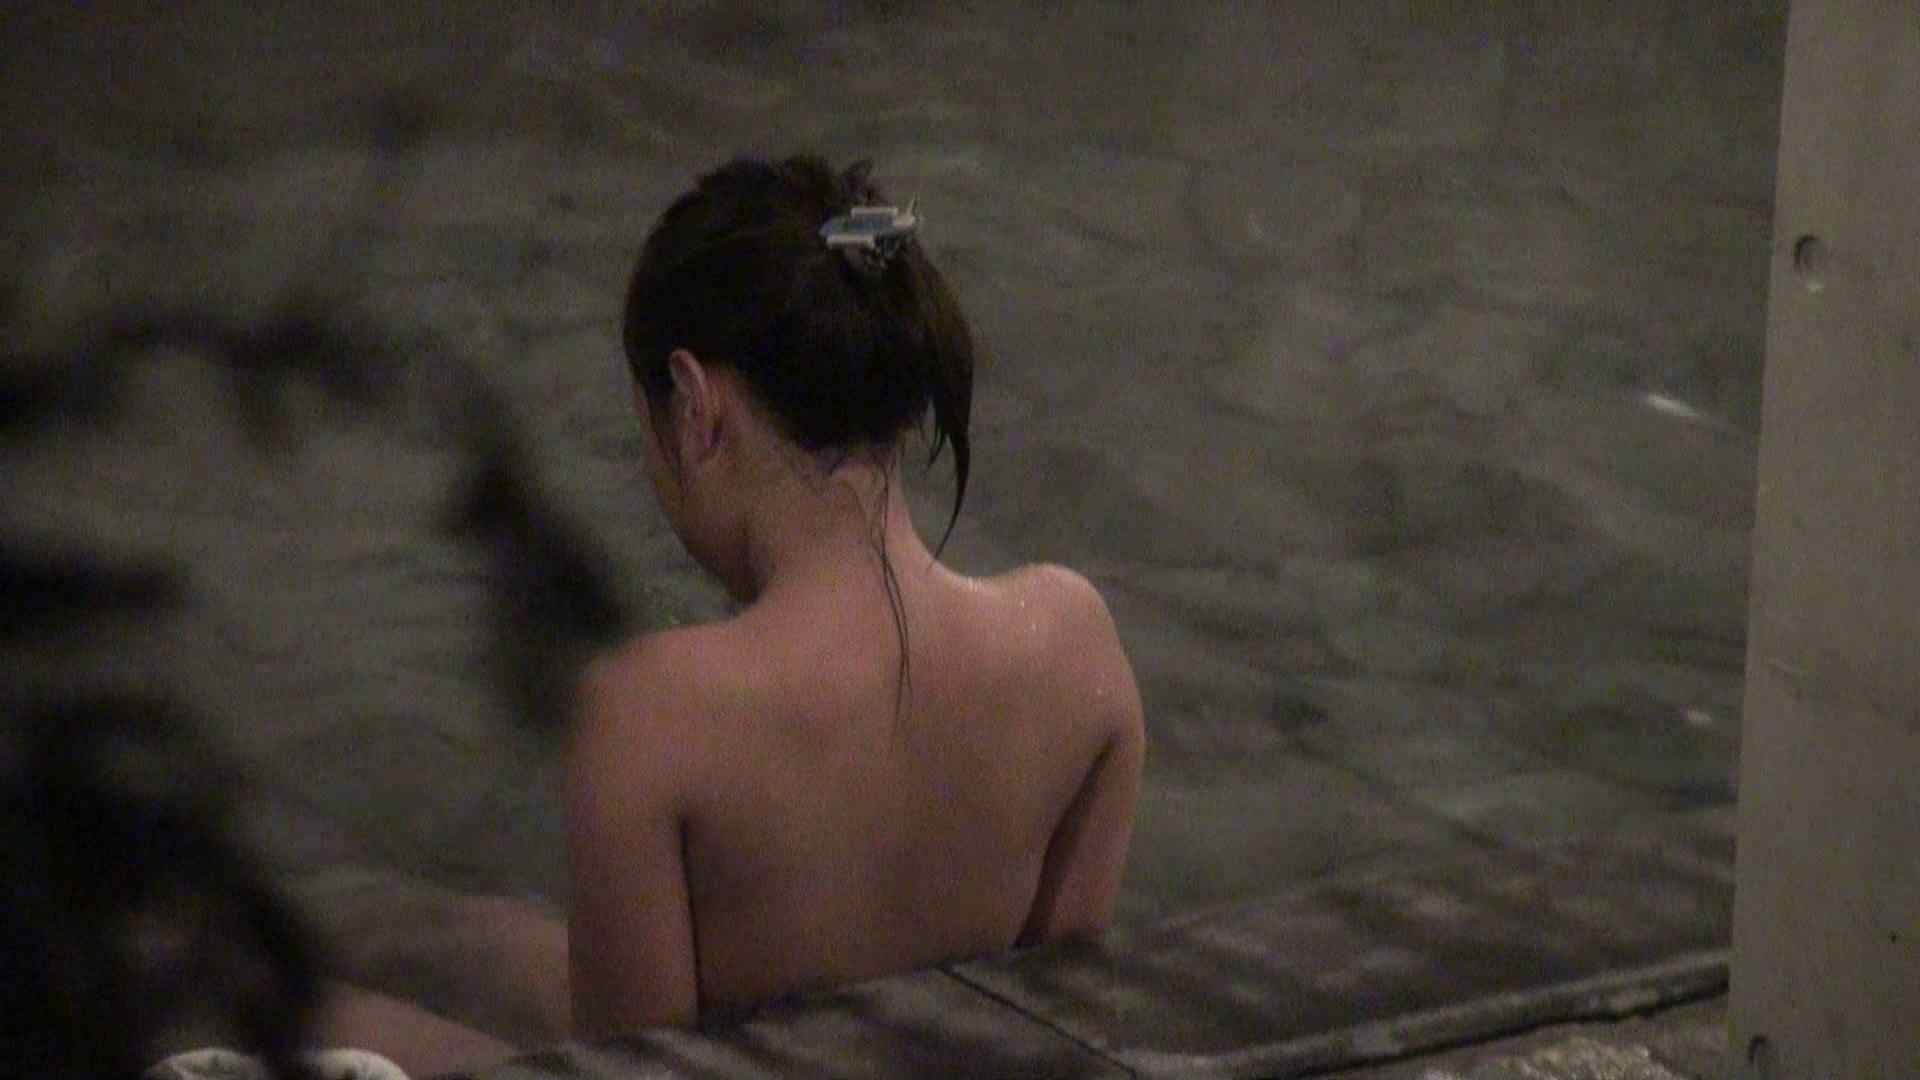 Aquaな露天風呂Vol.407 いやらしいOL われめAV動画紹介 67連発 67